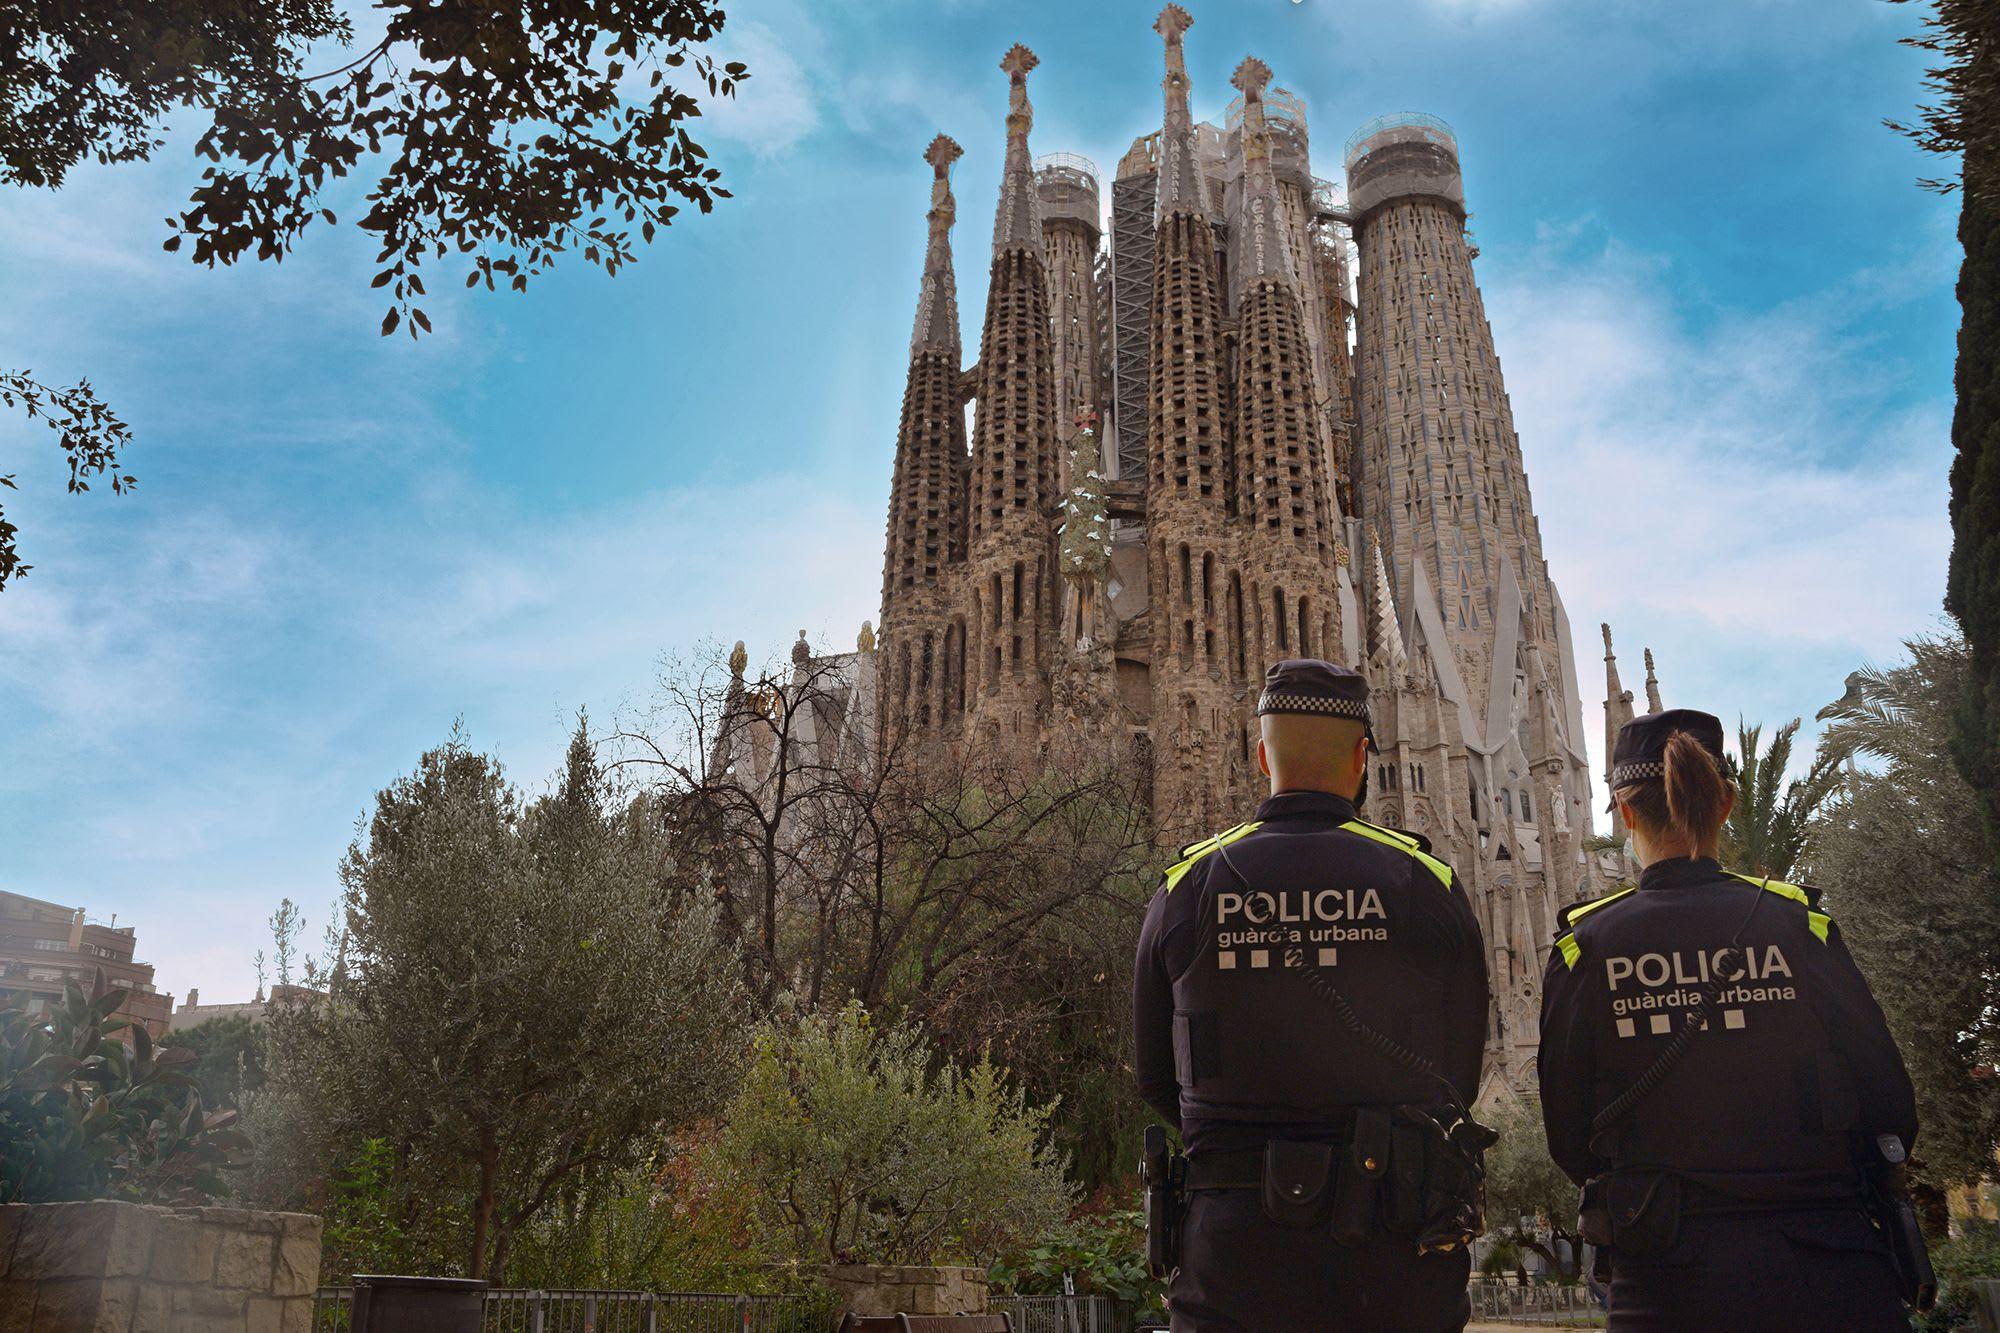 Curs Online Guàrdia Urbana Barcelona (Bloc 1)